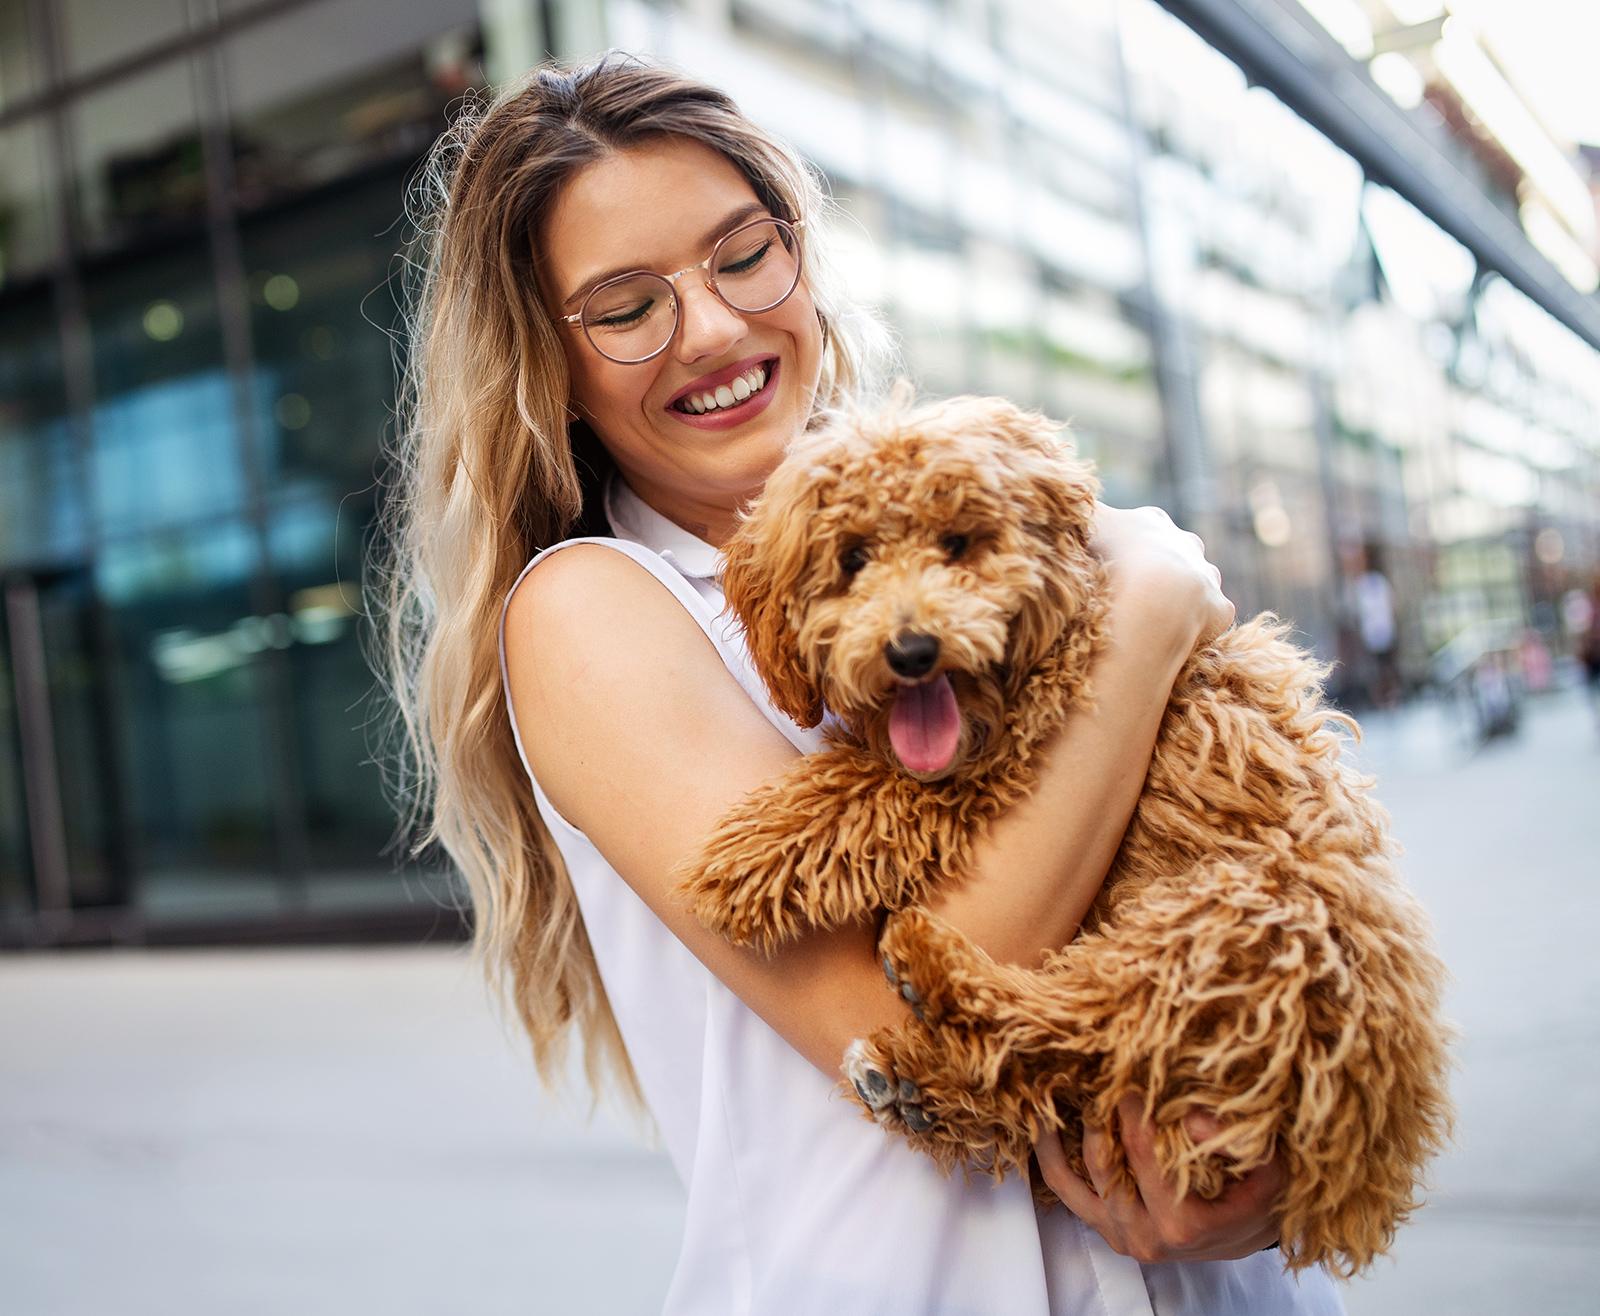 beauty-woman-with-her-dog-playing-outdoors-LN2XF4U.jpg